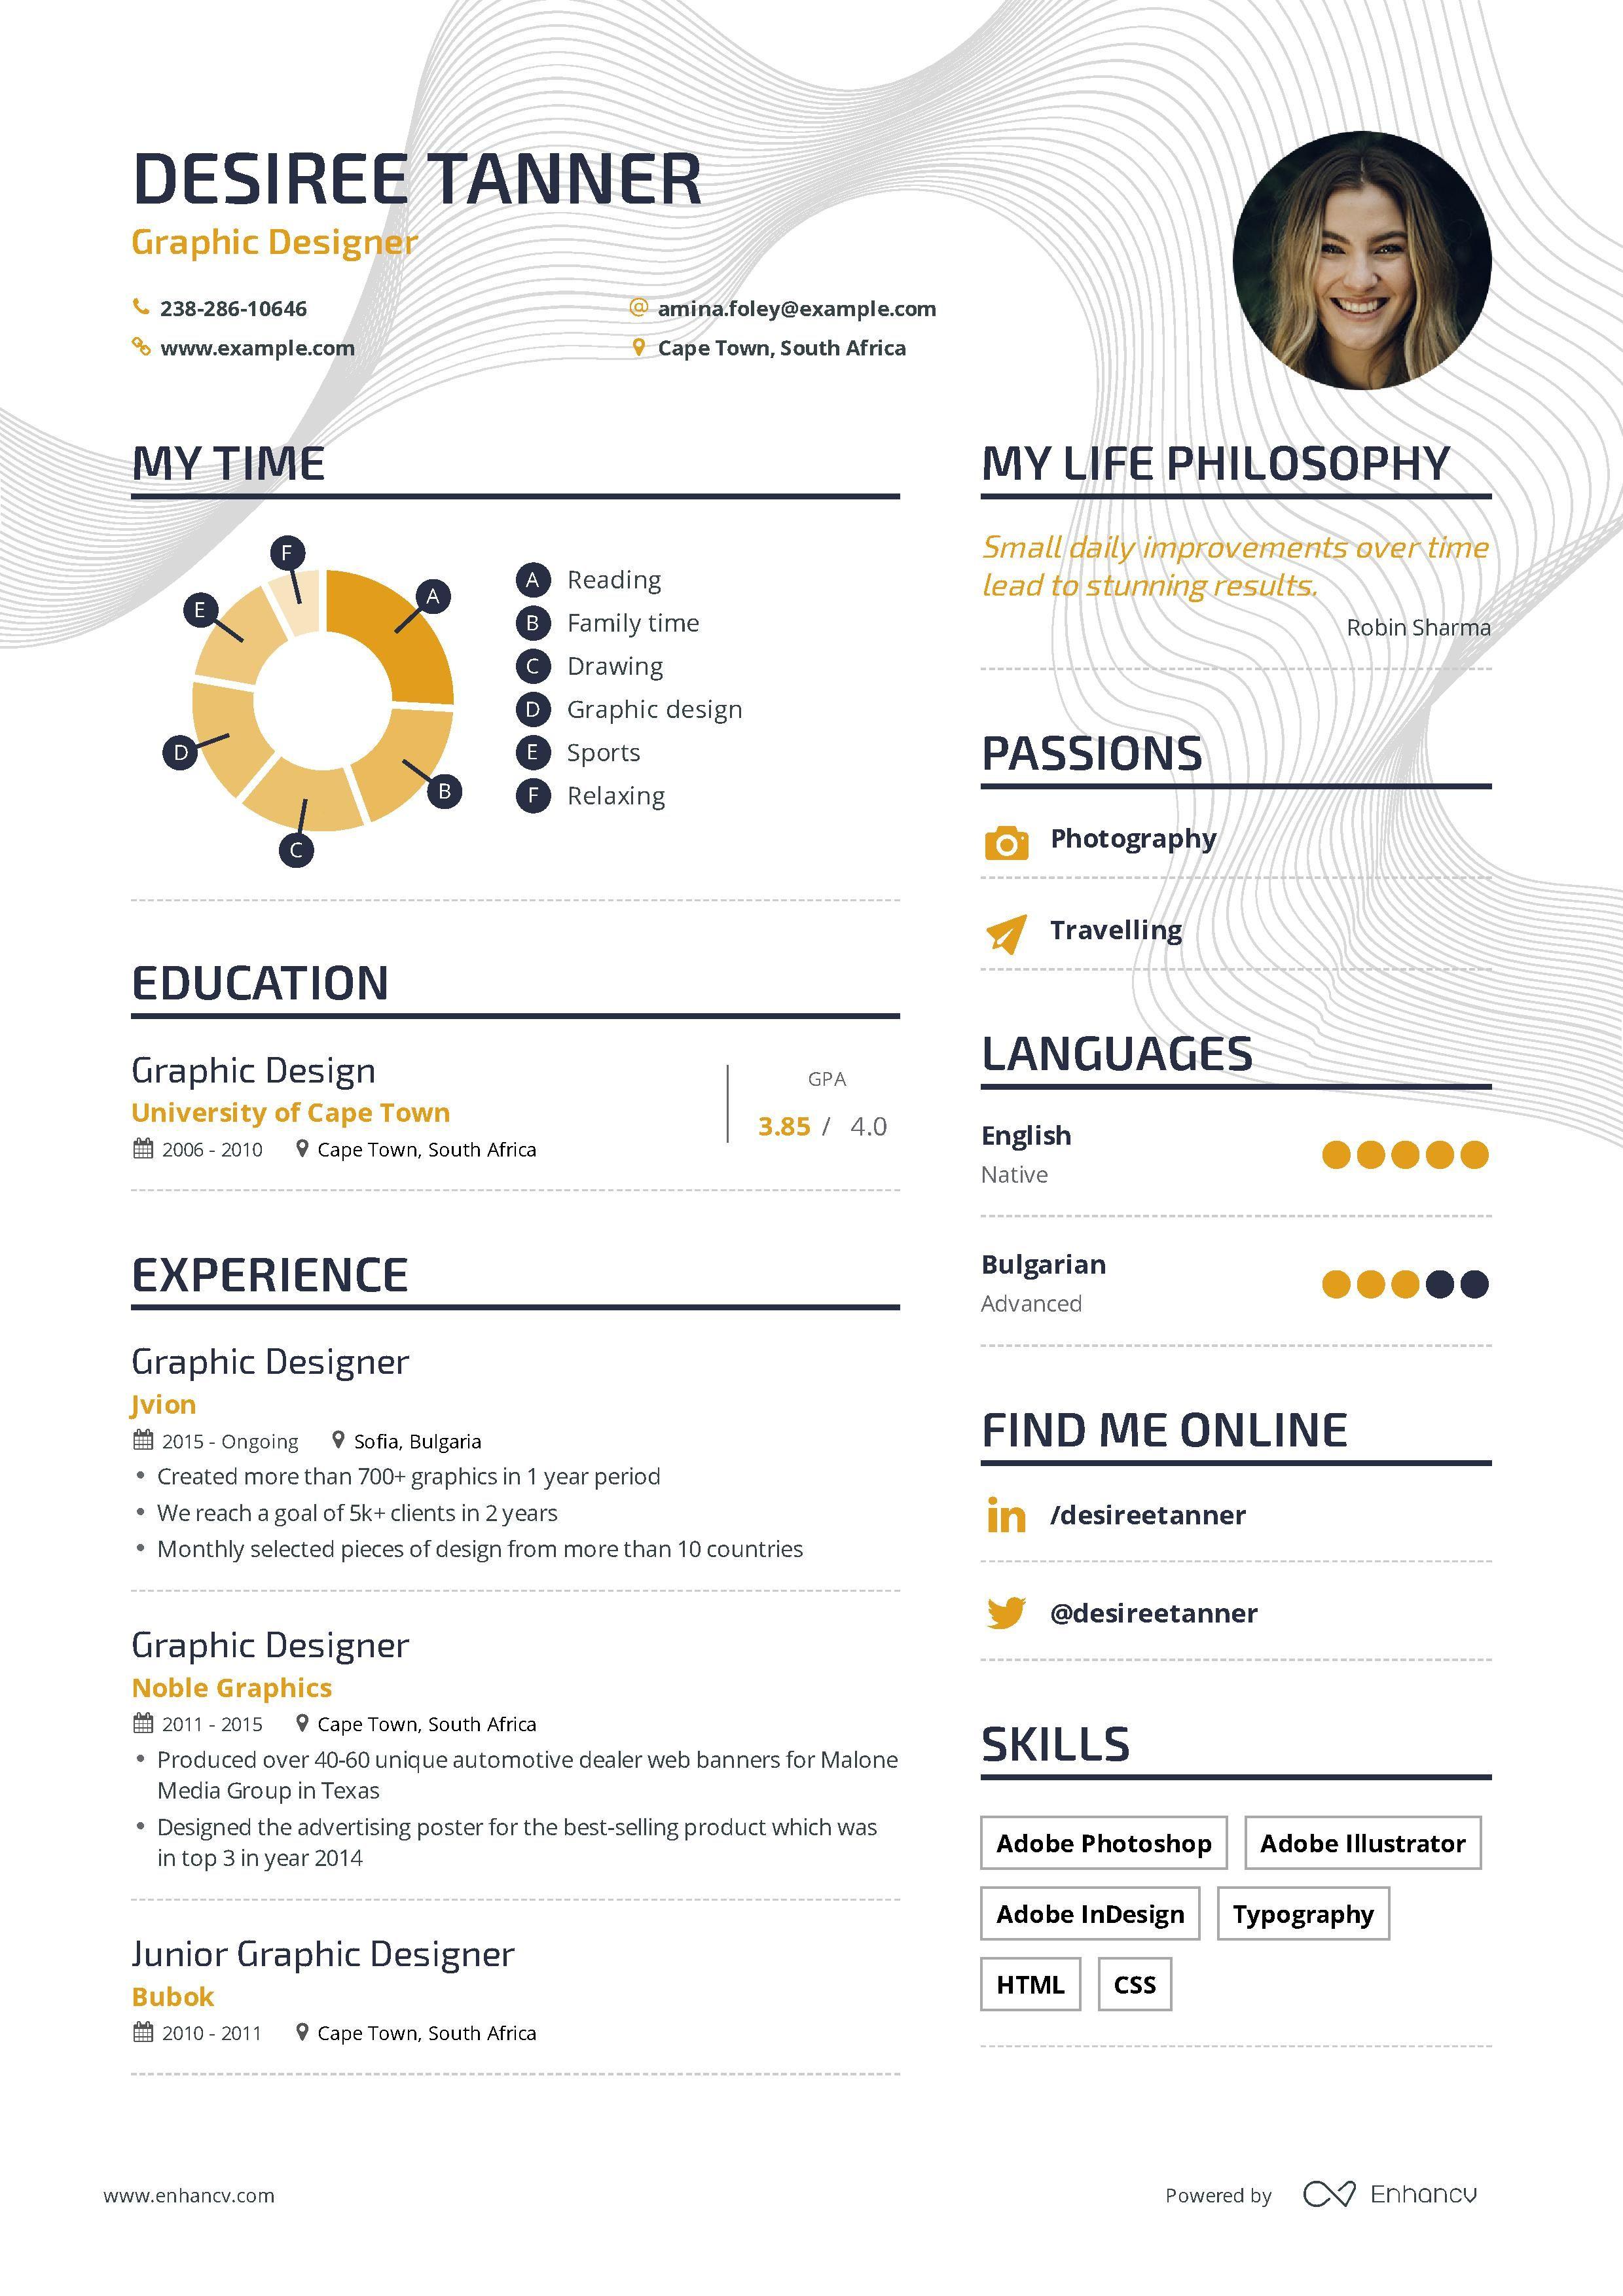 Graphic Designer Resume Examples, Skills, Templates & More